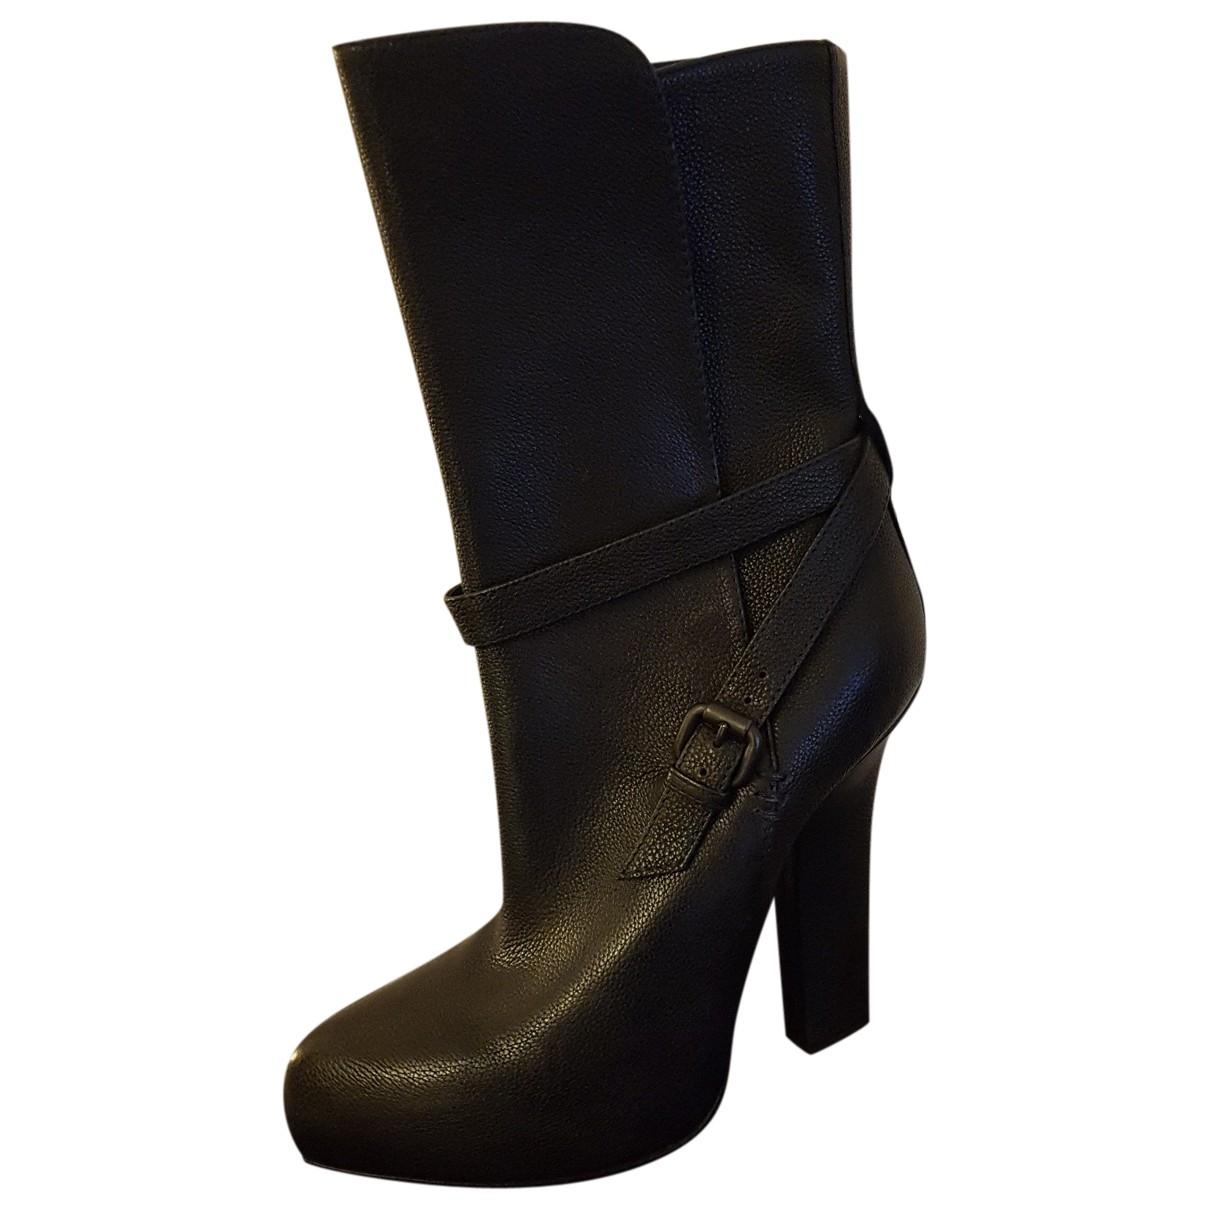 Bottega Veneta \N Black Leather Boots for Women 38 EU